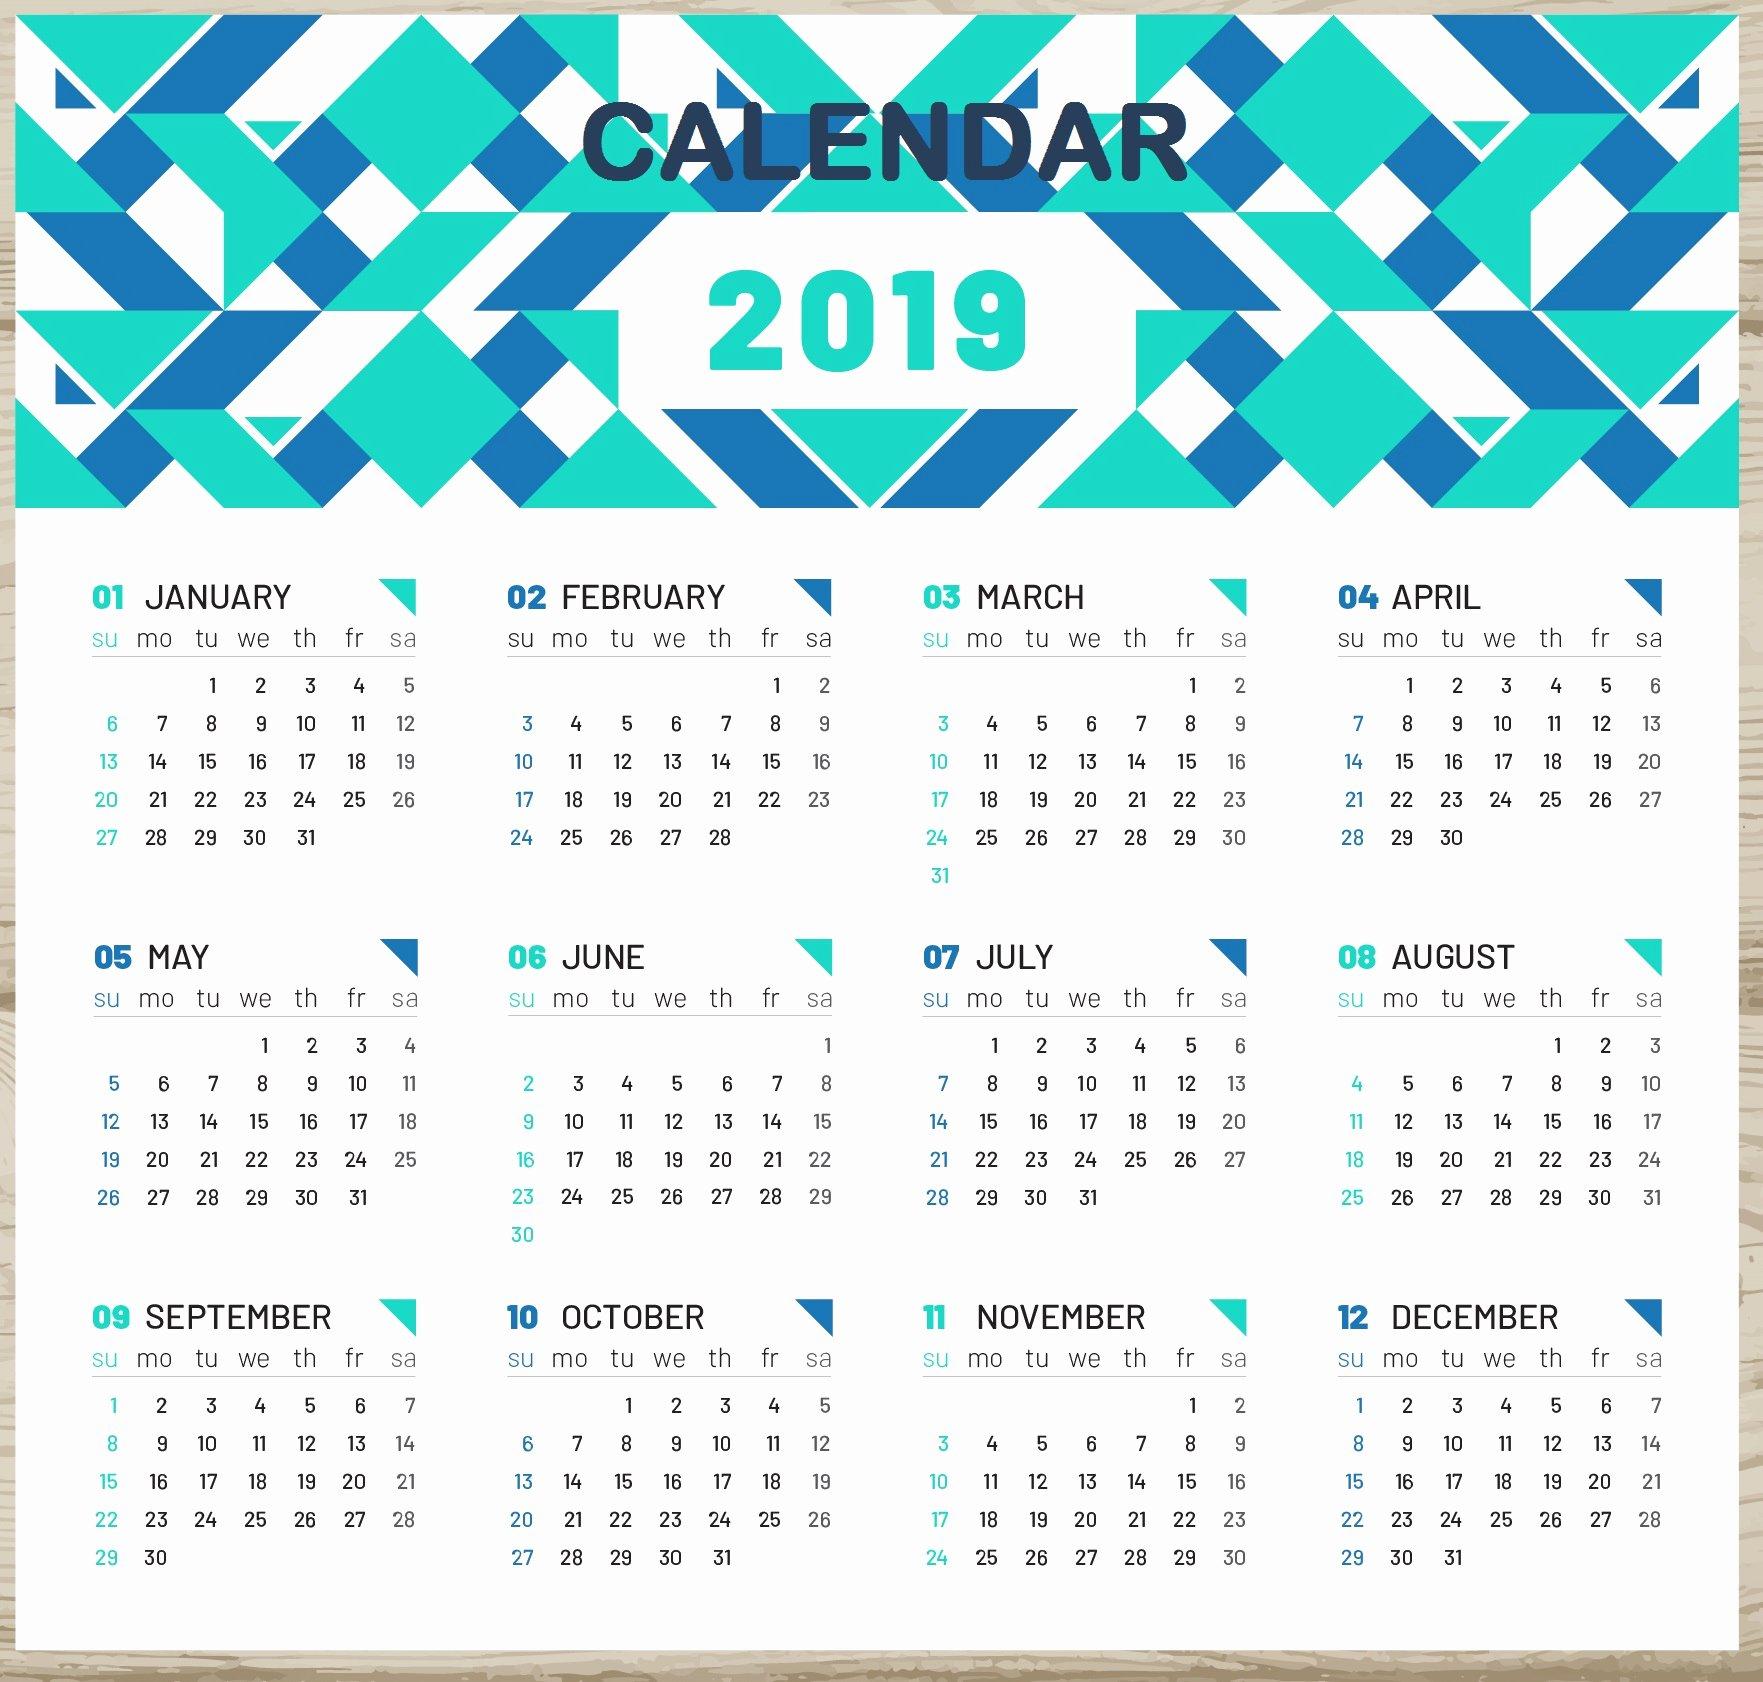 Microsoft Calendar Templates 2019 Unique 2019 Calendar with Week Numbers Printable